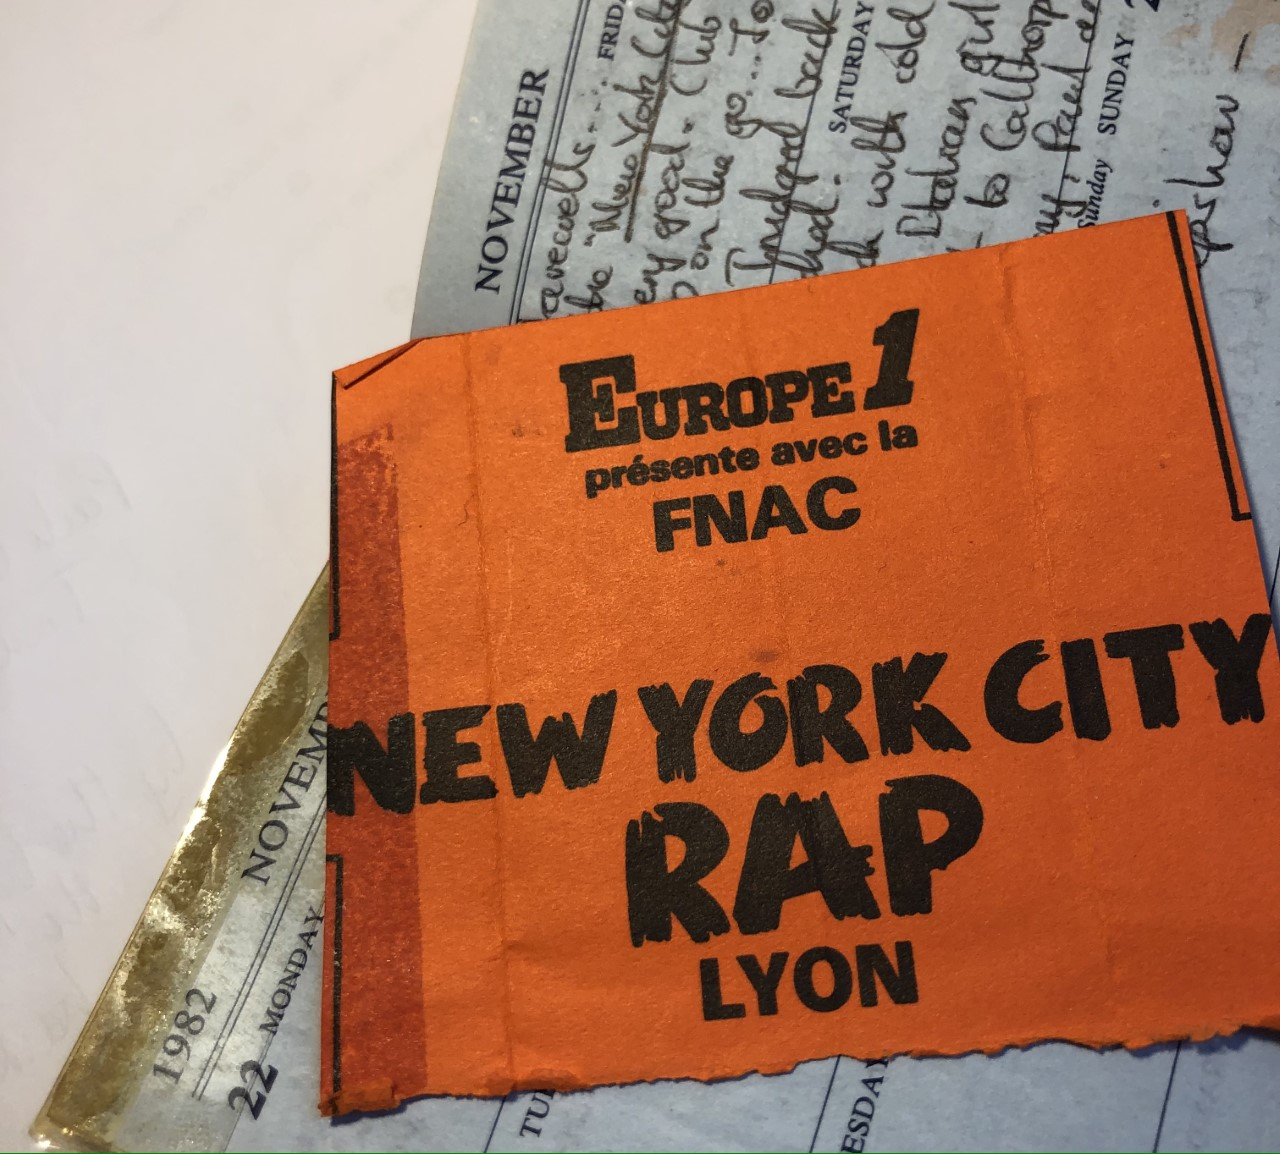 hip-hop image